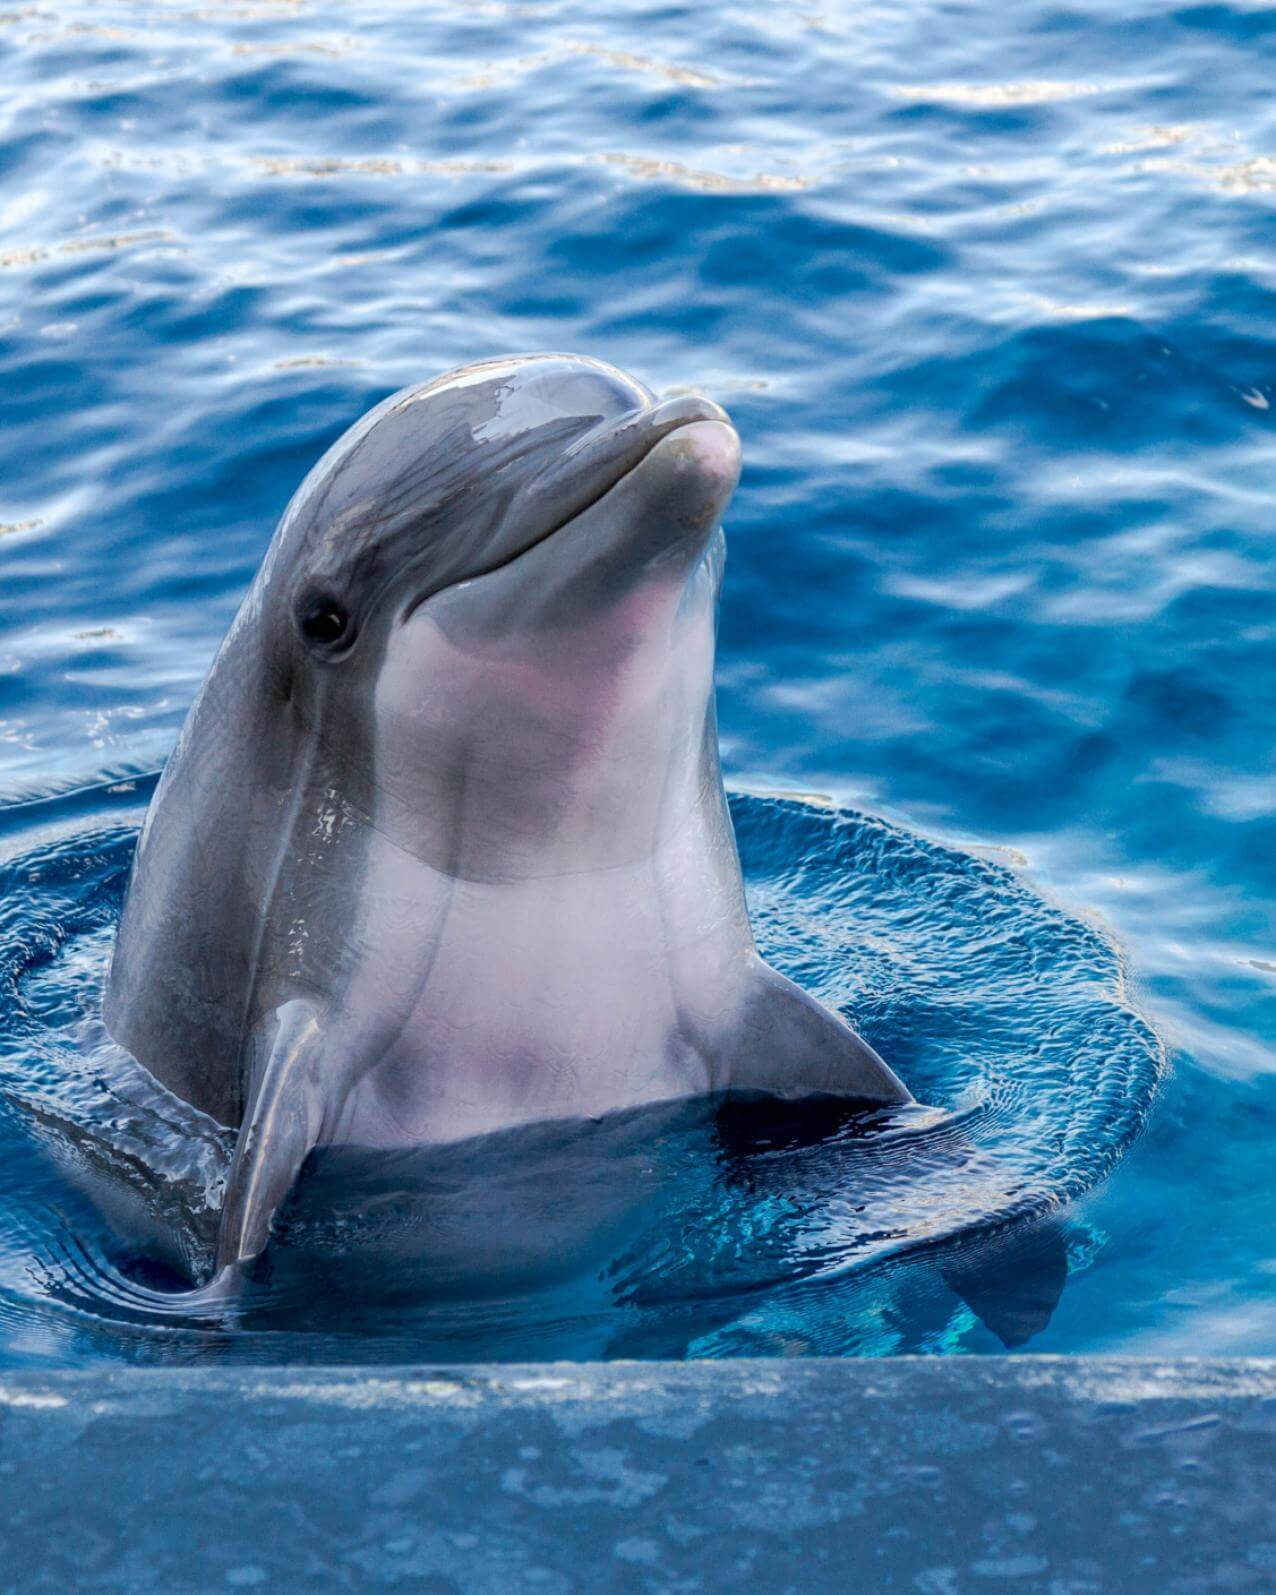 Dolphin - Original image